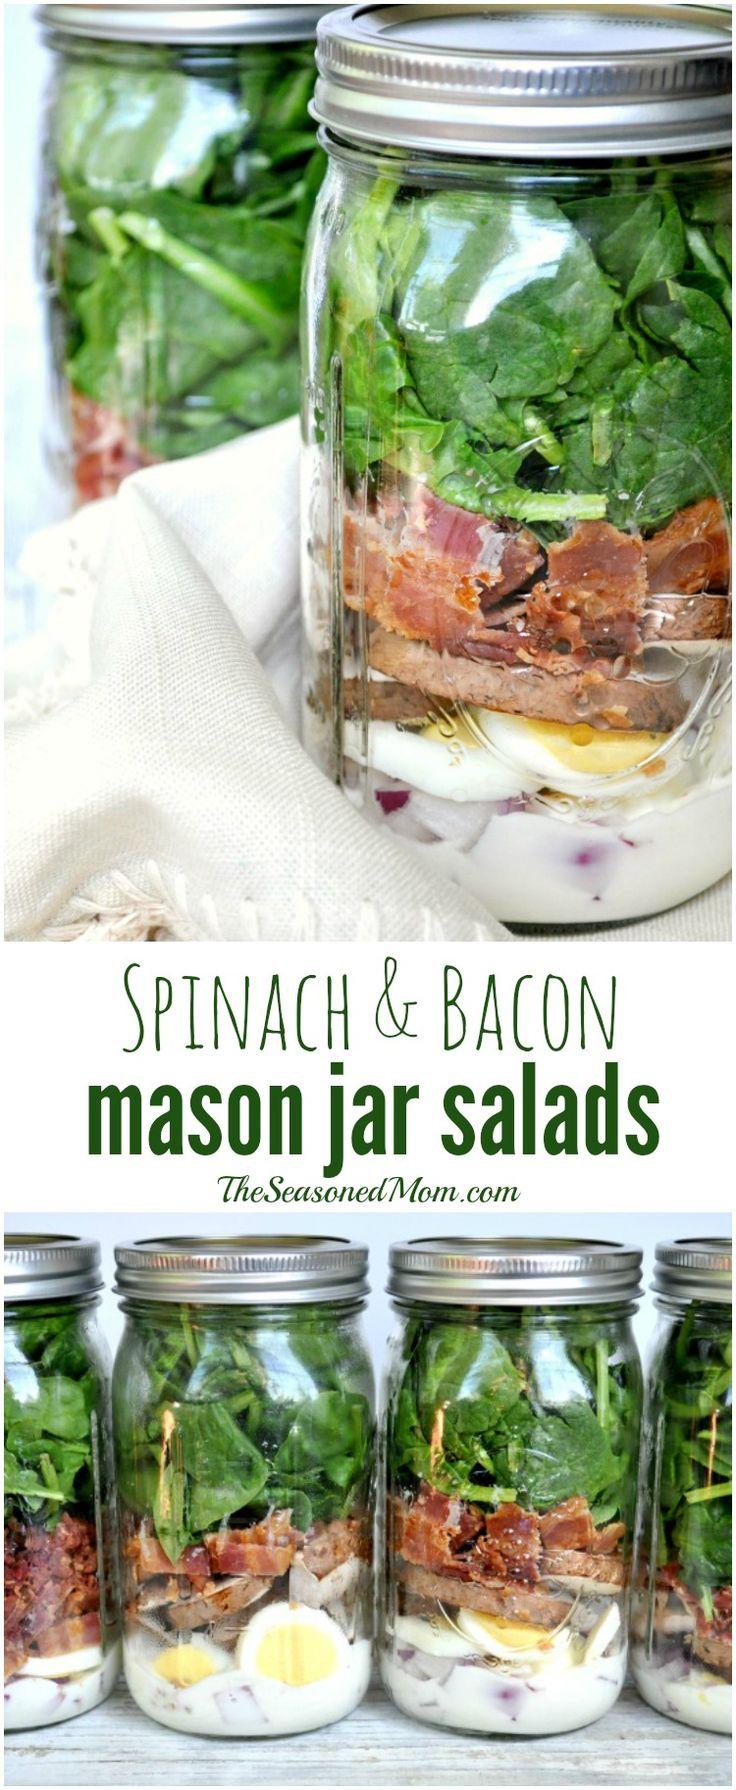 Spinach and Bacon Mason Jar Salads